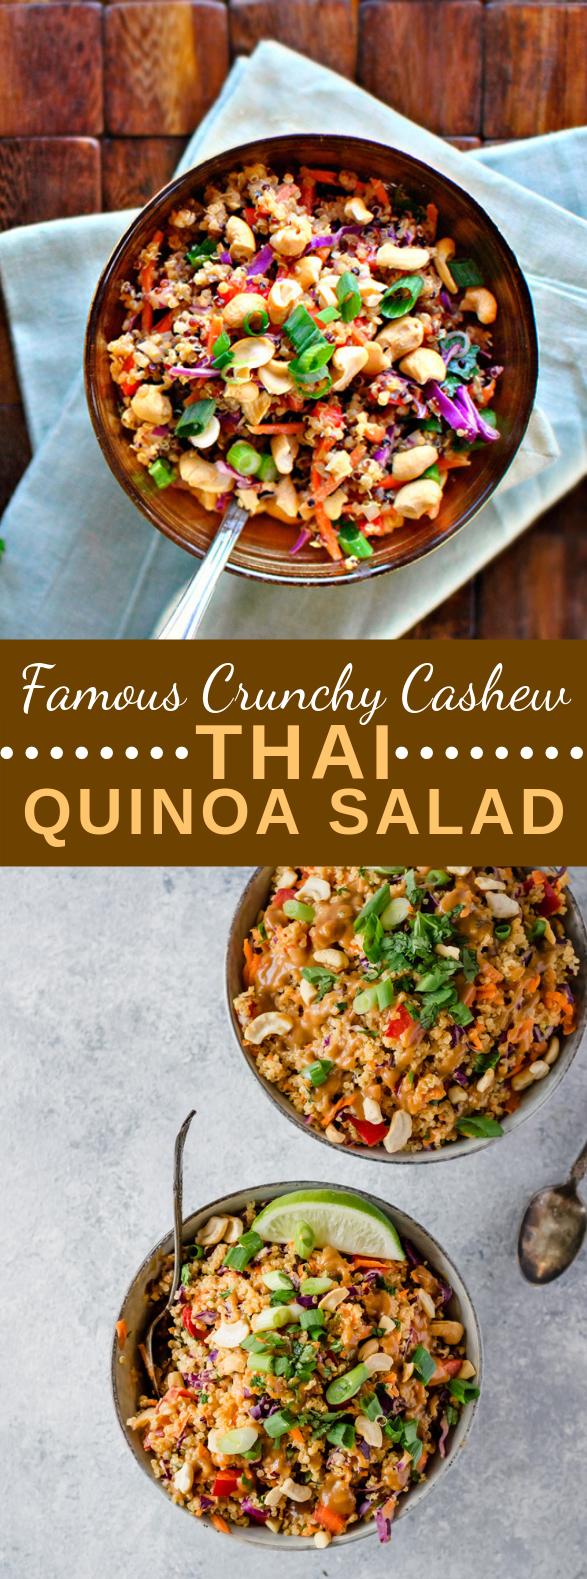 Famous Crunchy Cashew Thai Quinoa Salad {vegan & gluten-free} #vegetariansalad #mealprep